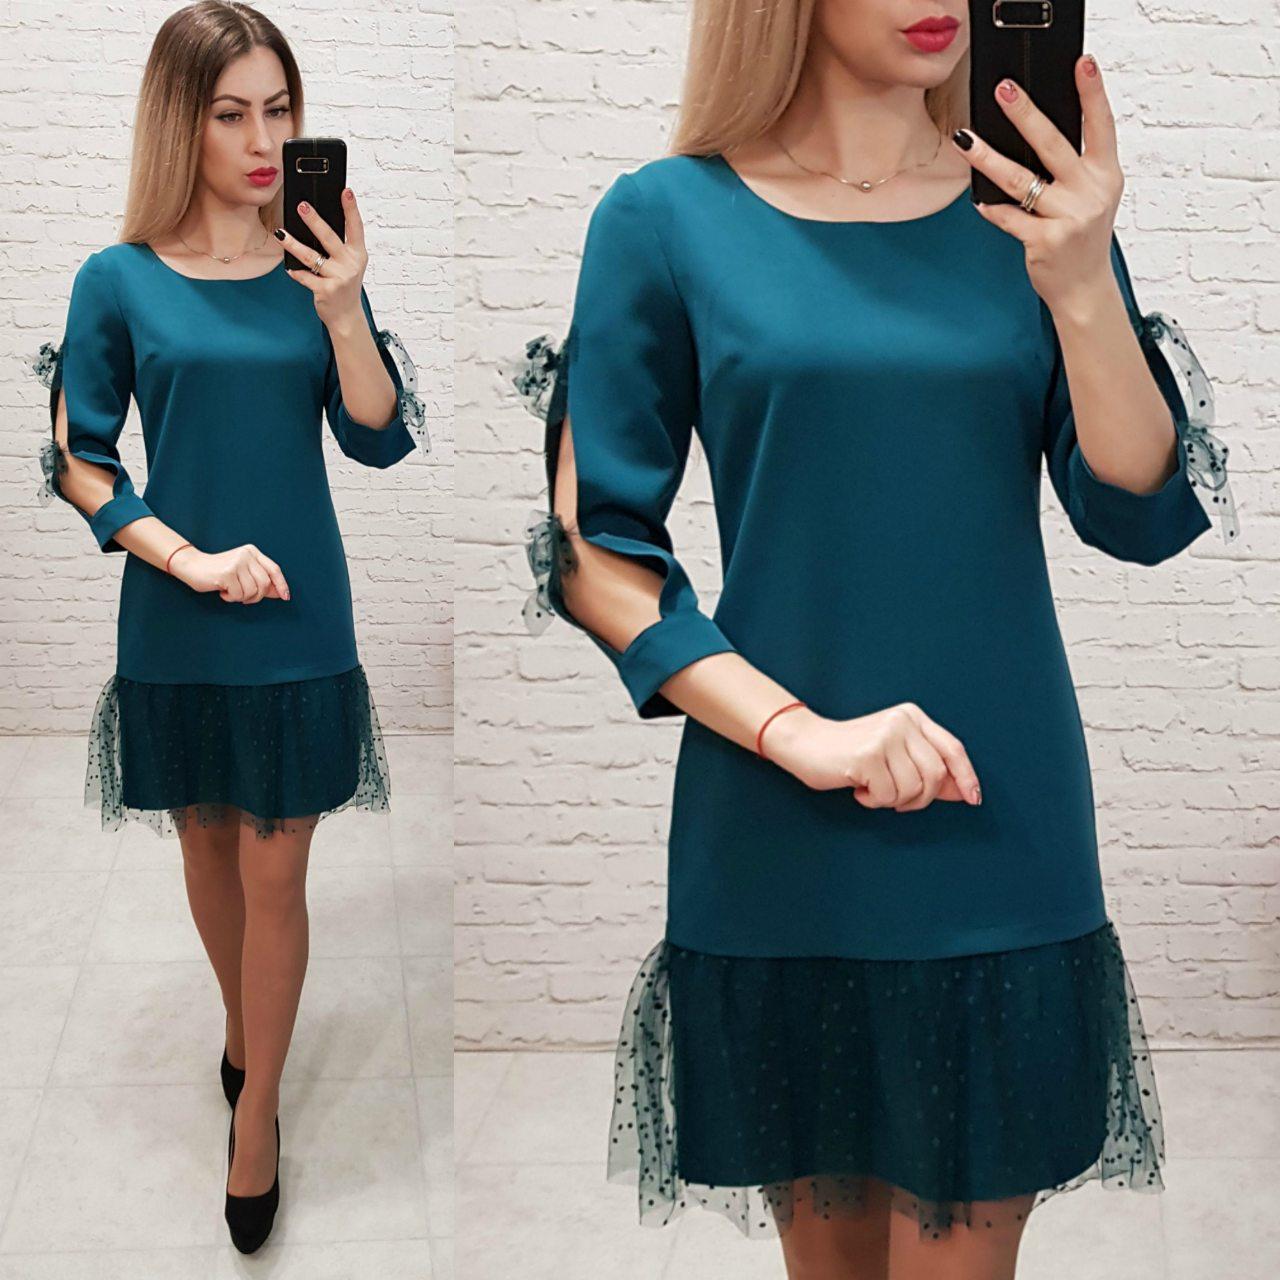 Платье женское, креп+сетка, модель 154, цвет - бутылочка